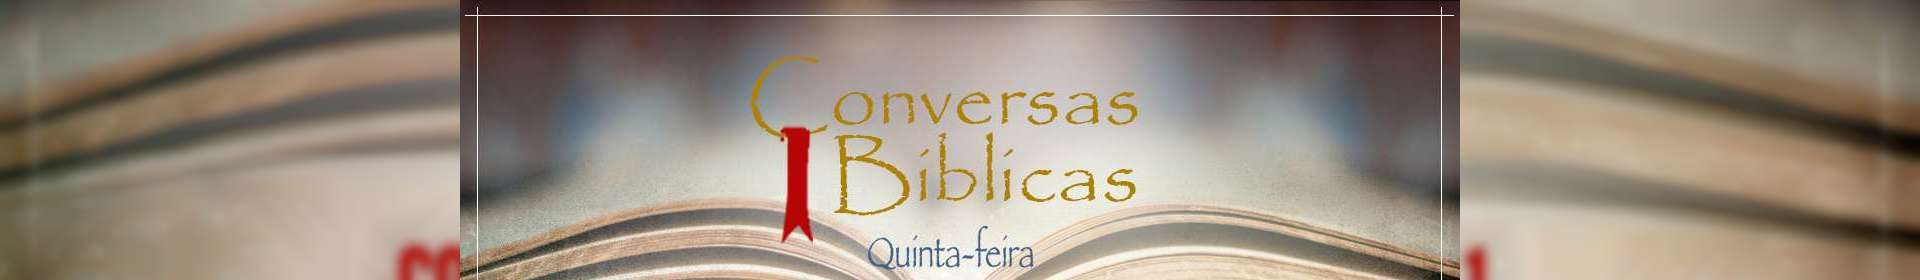 Conversas Bíblicas: Corpo Vivo e Corpo Morto - Parte 1